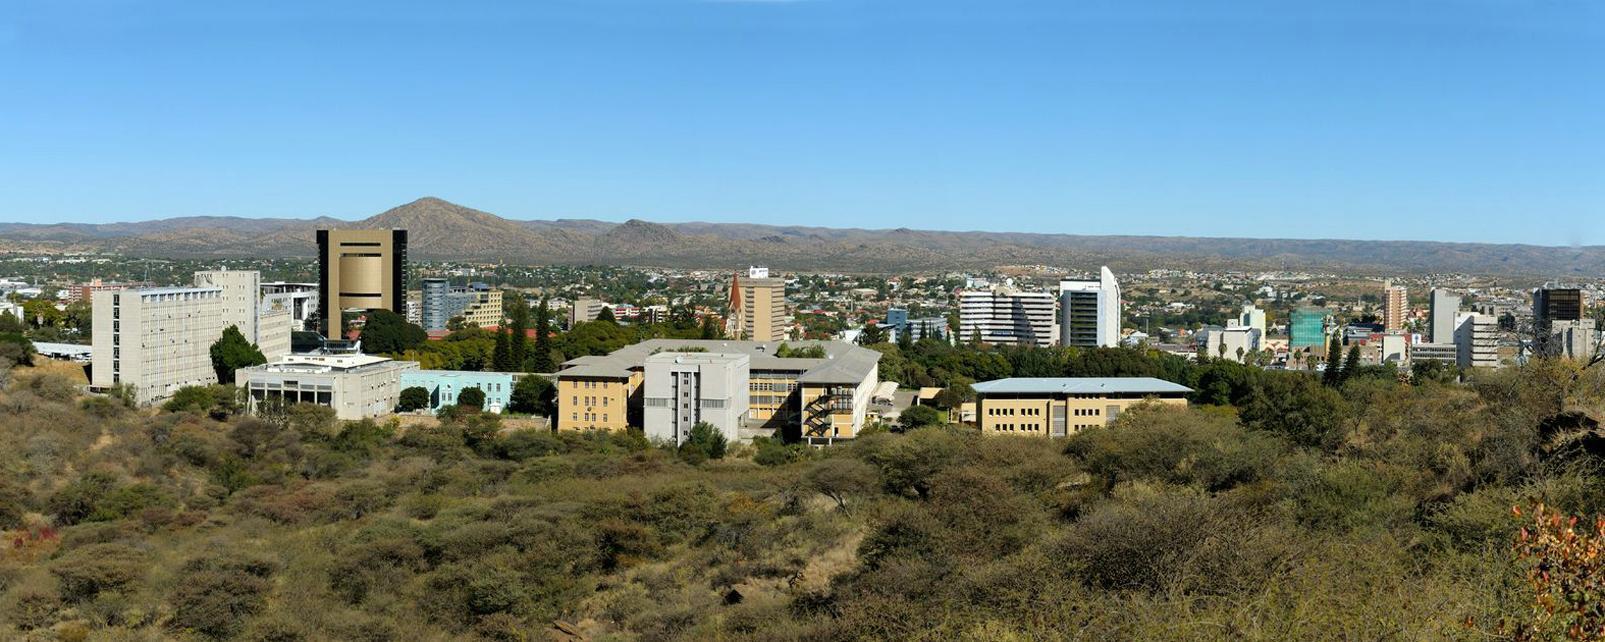 Afrique; Namibie; Windhoek;